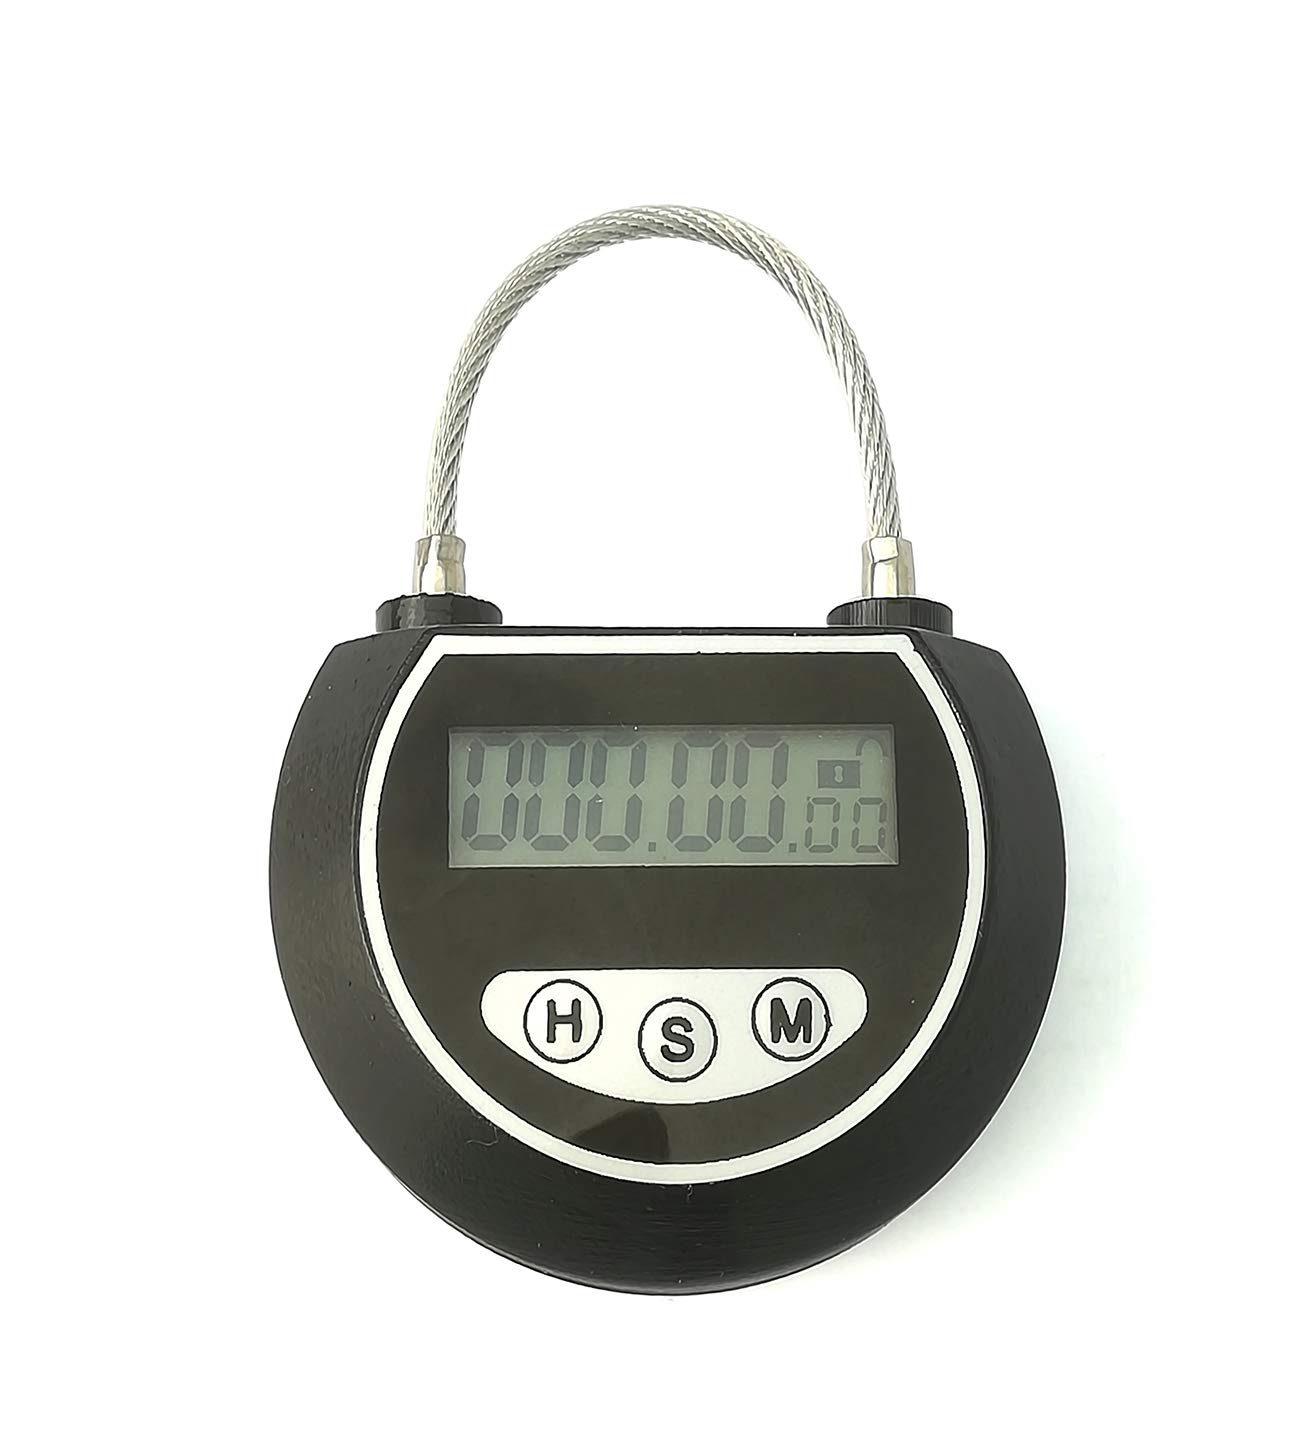 Automatic Unlocking Timing Lock The Kitchen Cabinet Lock Padlock Timekeeping Lock Without Charging Use